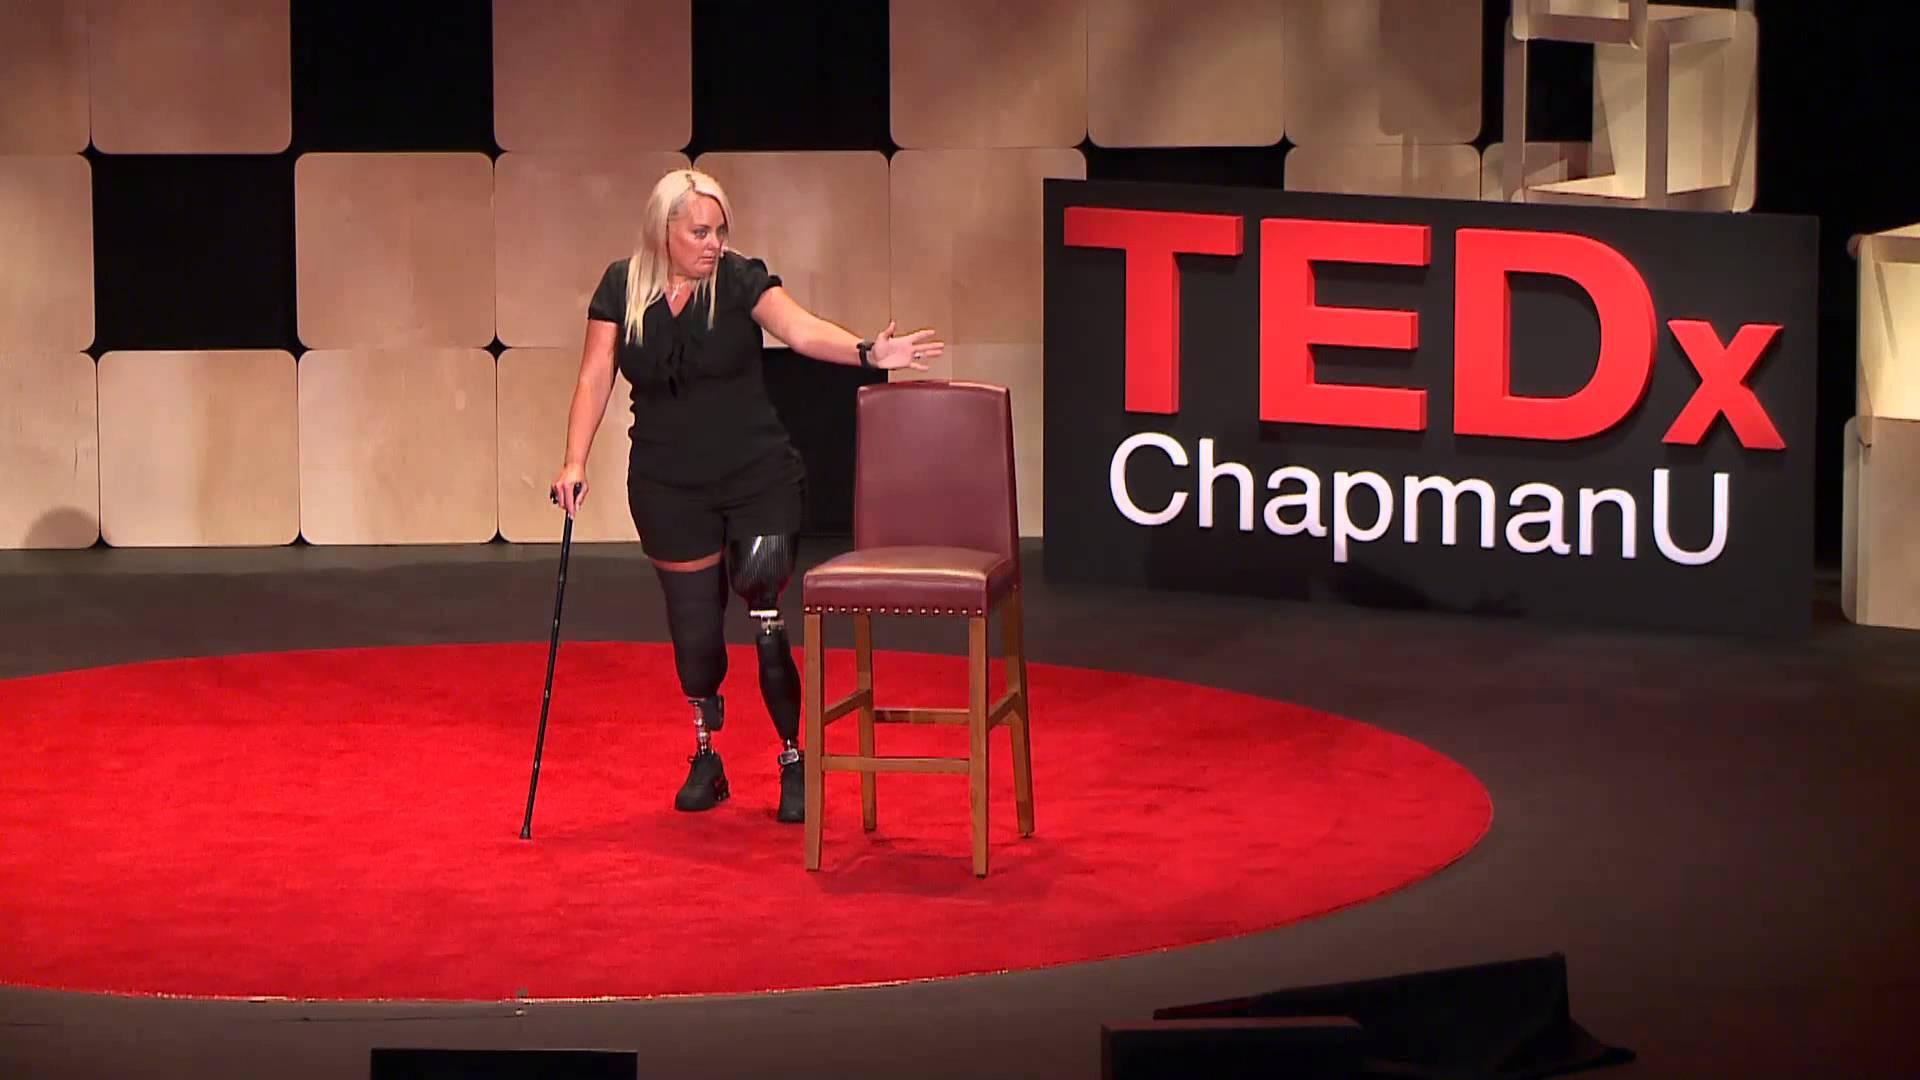 Stephanie Decker at TEDx ChapmanU in June 2014